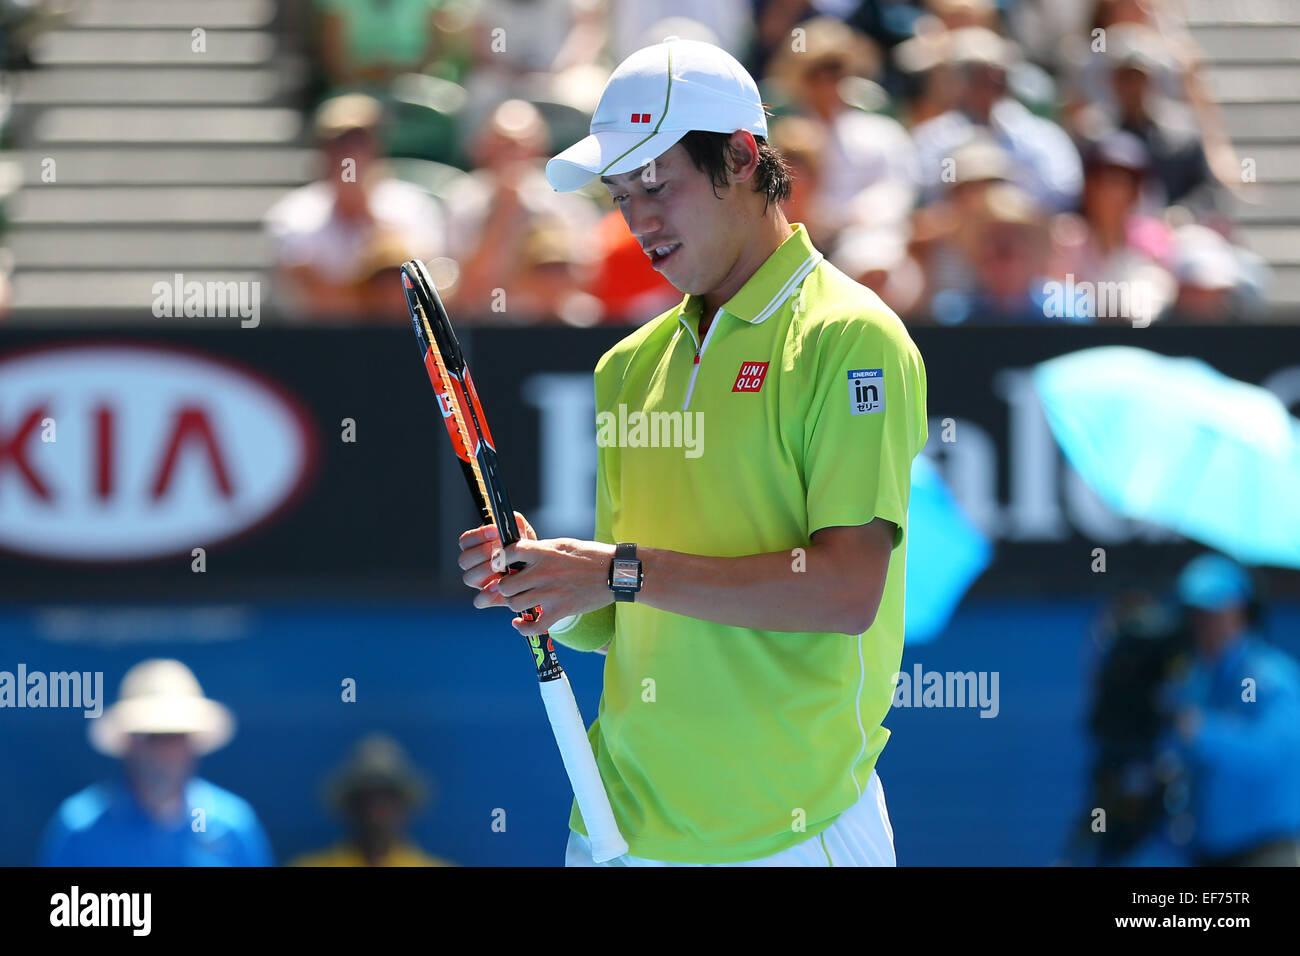 Melbourne, Australien. 28. Januar 2015. Kei Nishikori (JPN) Tennis: 2015 Australian Open Tennis Turnier Herren Viertelfinale Stockfoto